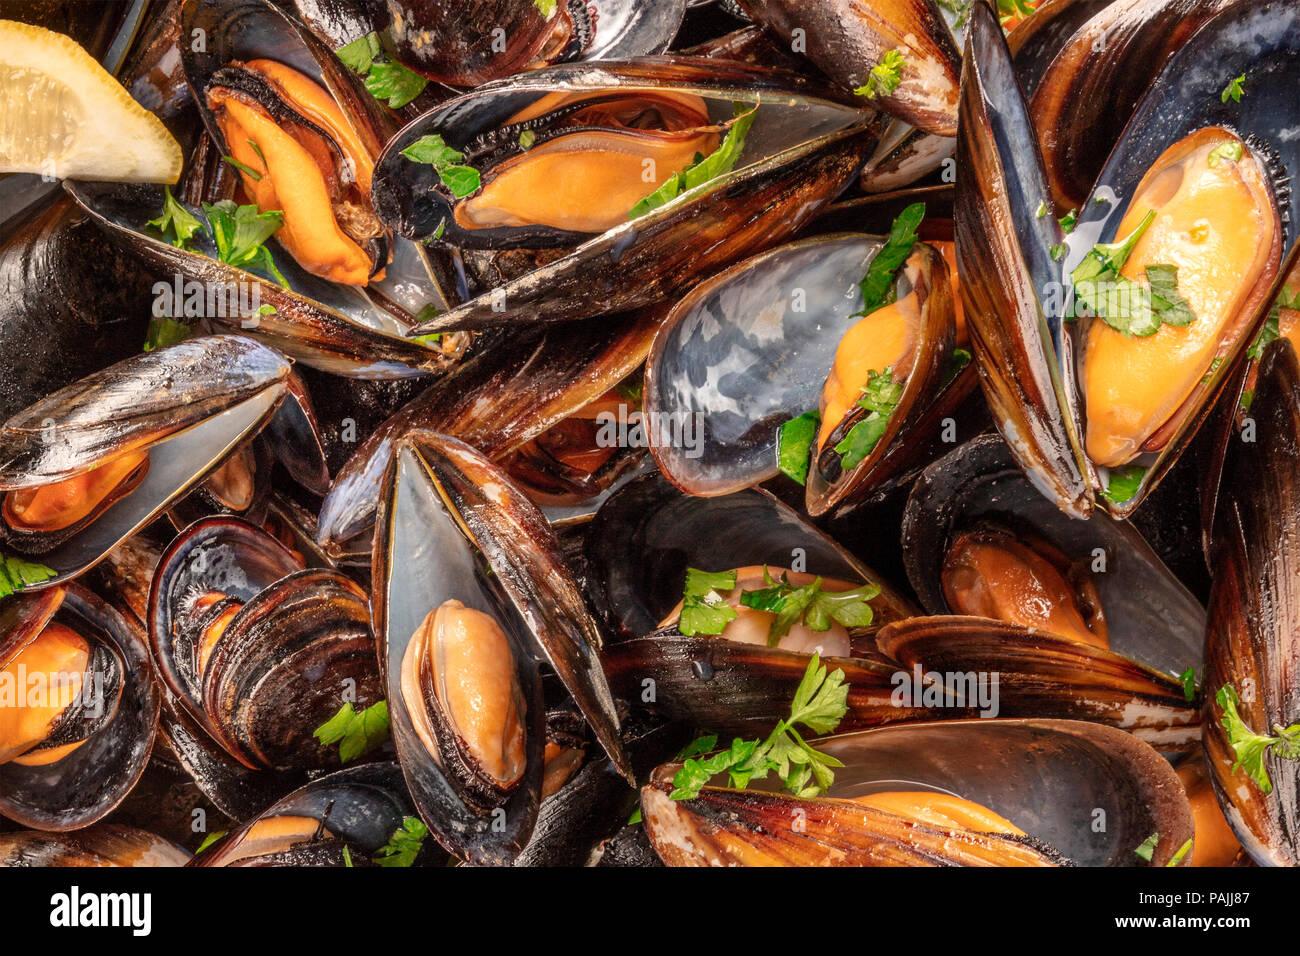 Primer plano de mejillones cocidos, tomada desde arriba Imagen De Stock